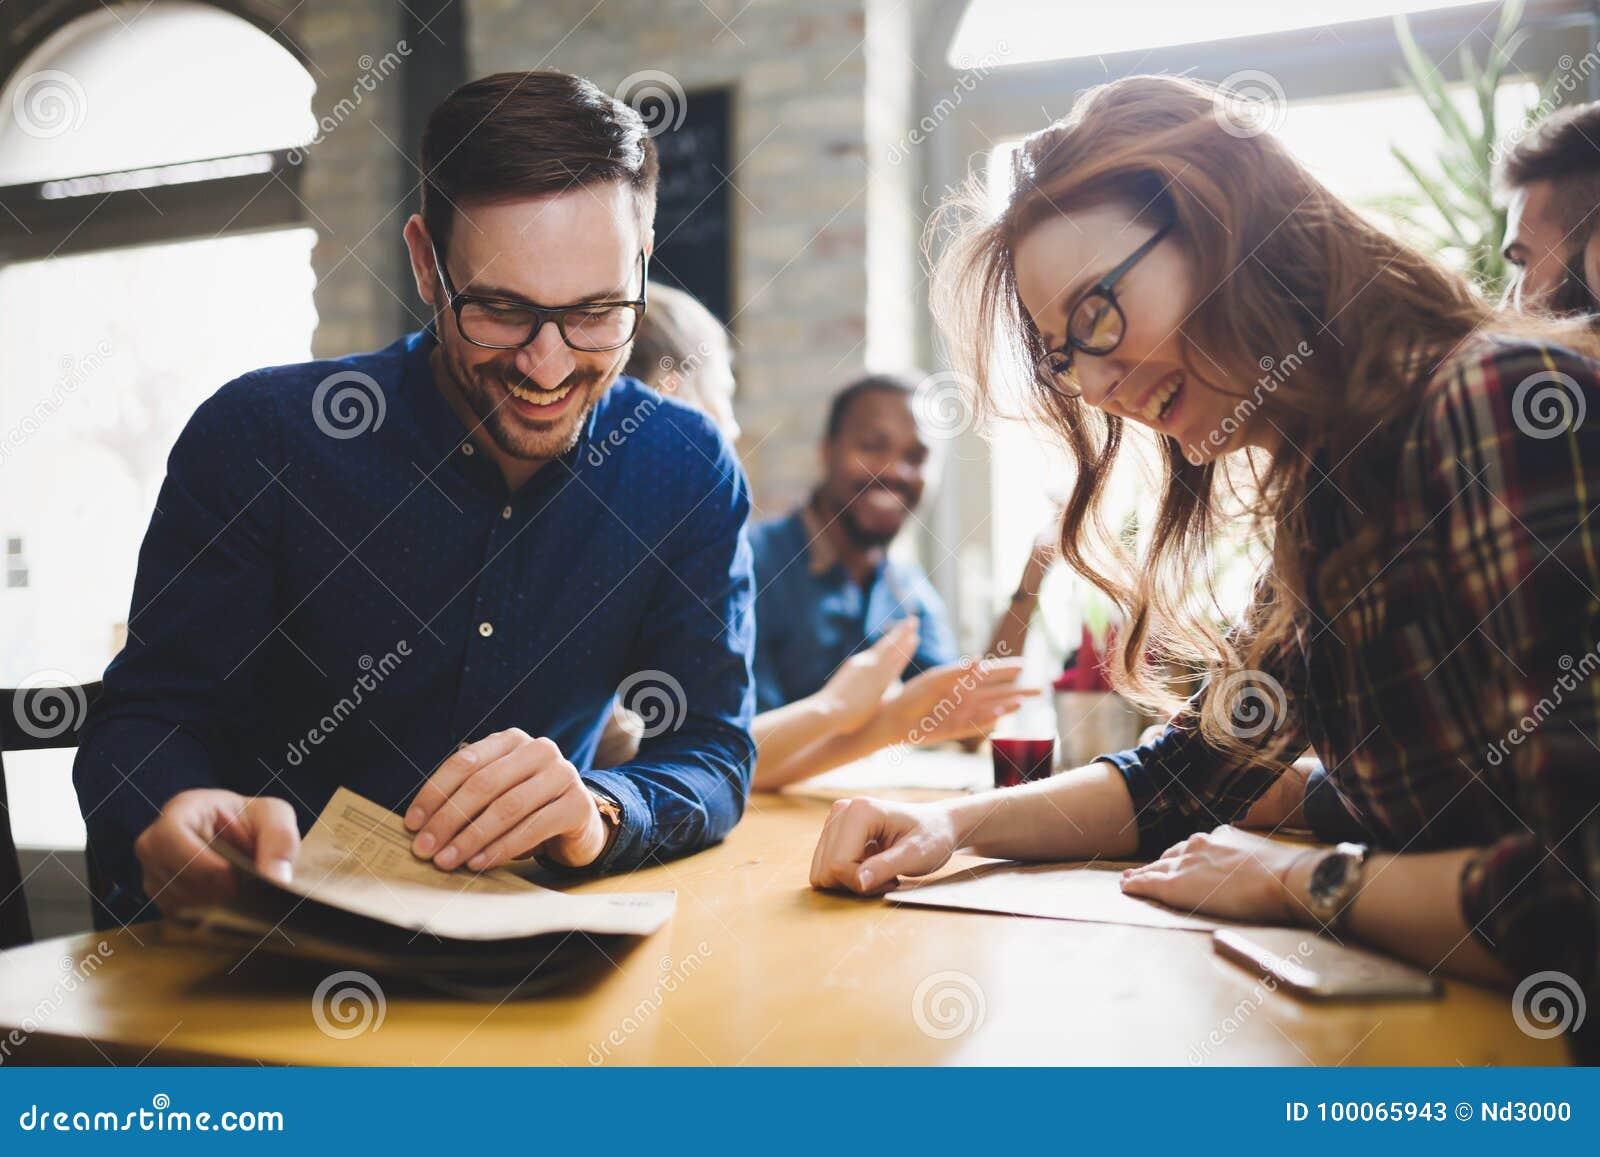 Dating restaurant co worker